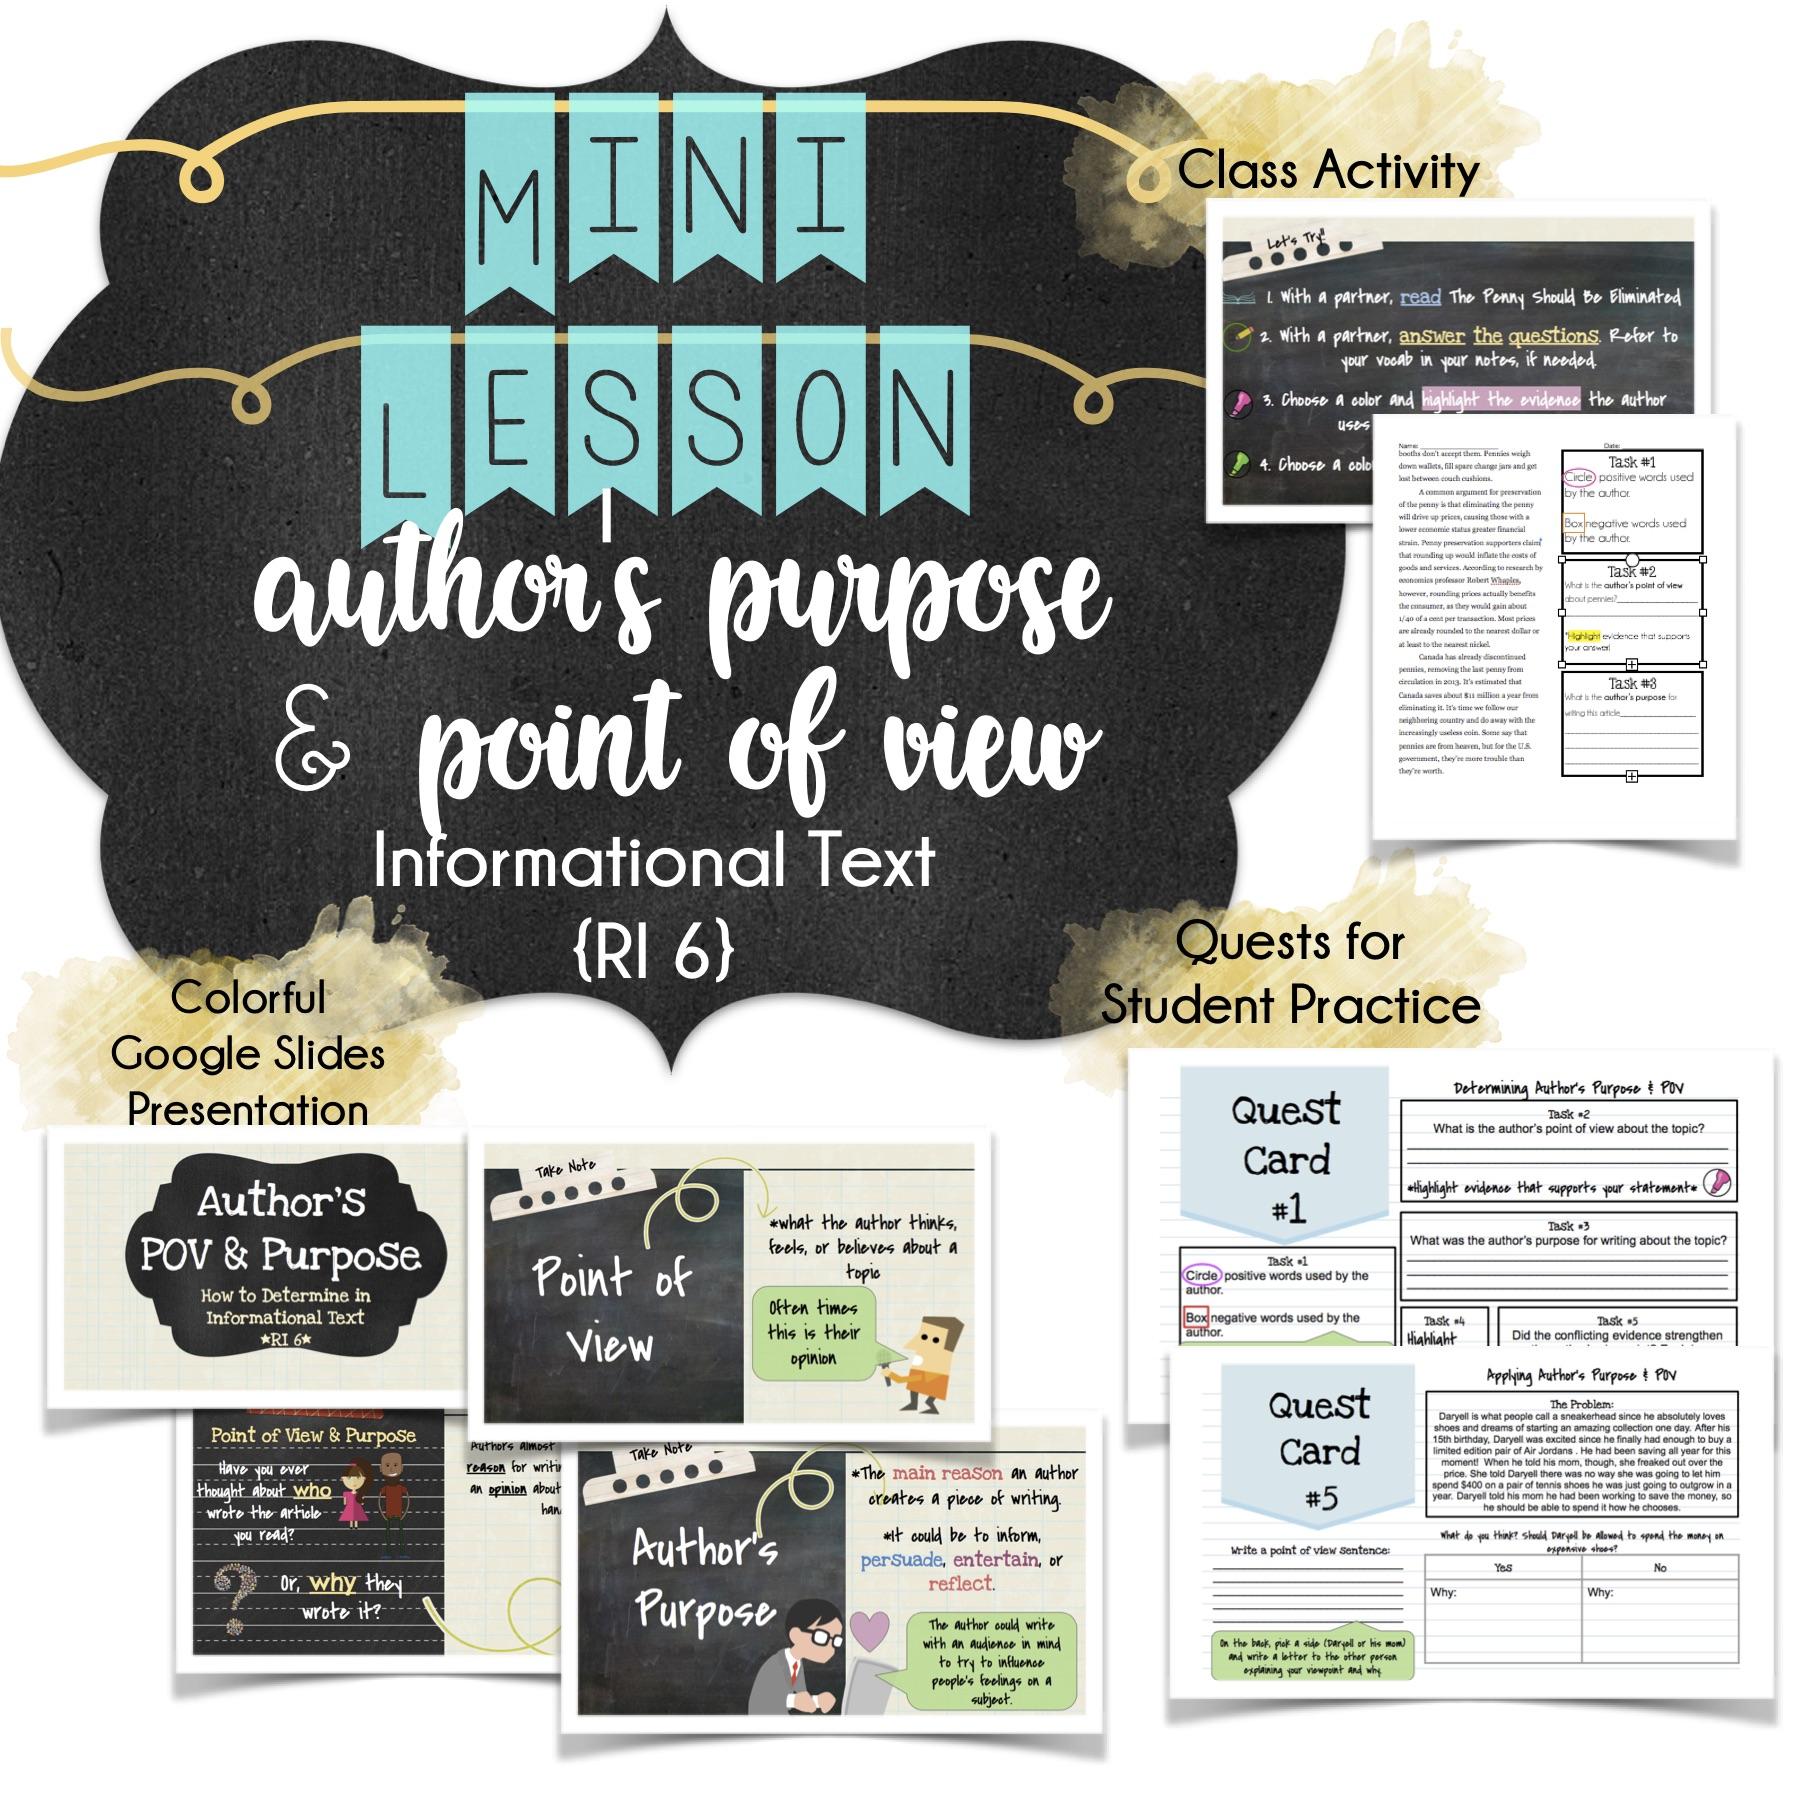 Tptcovers_authorsPOV_Purpose.jpg